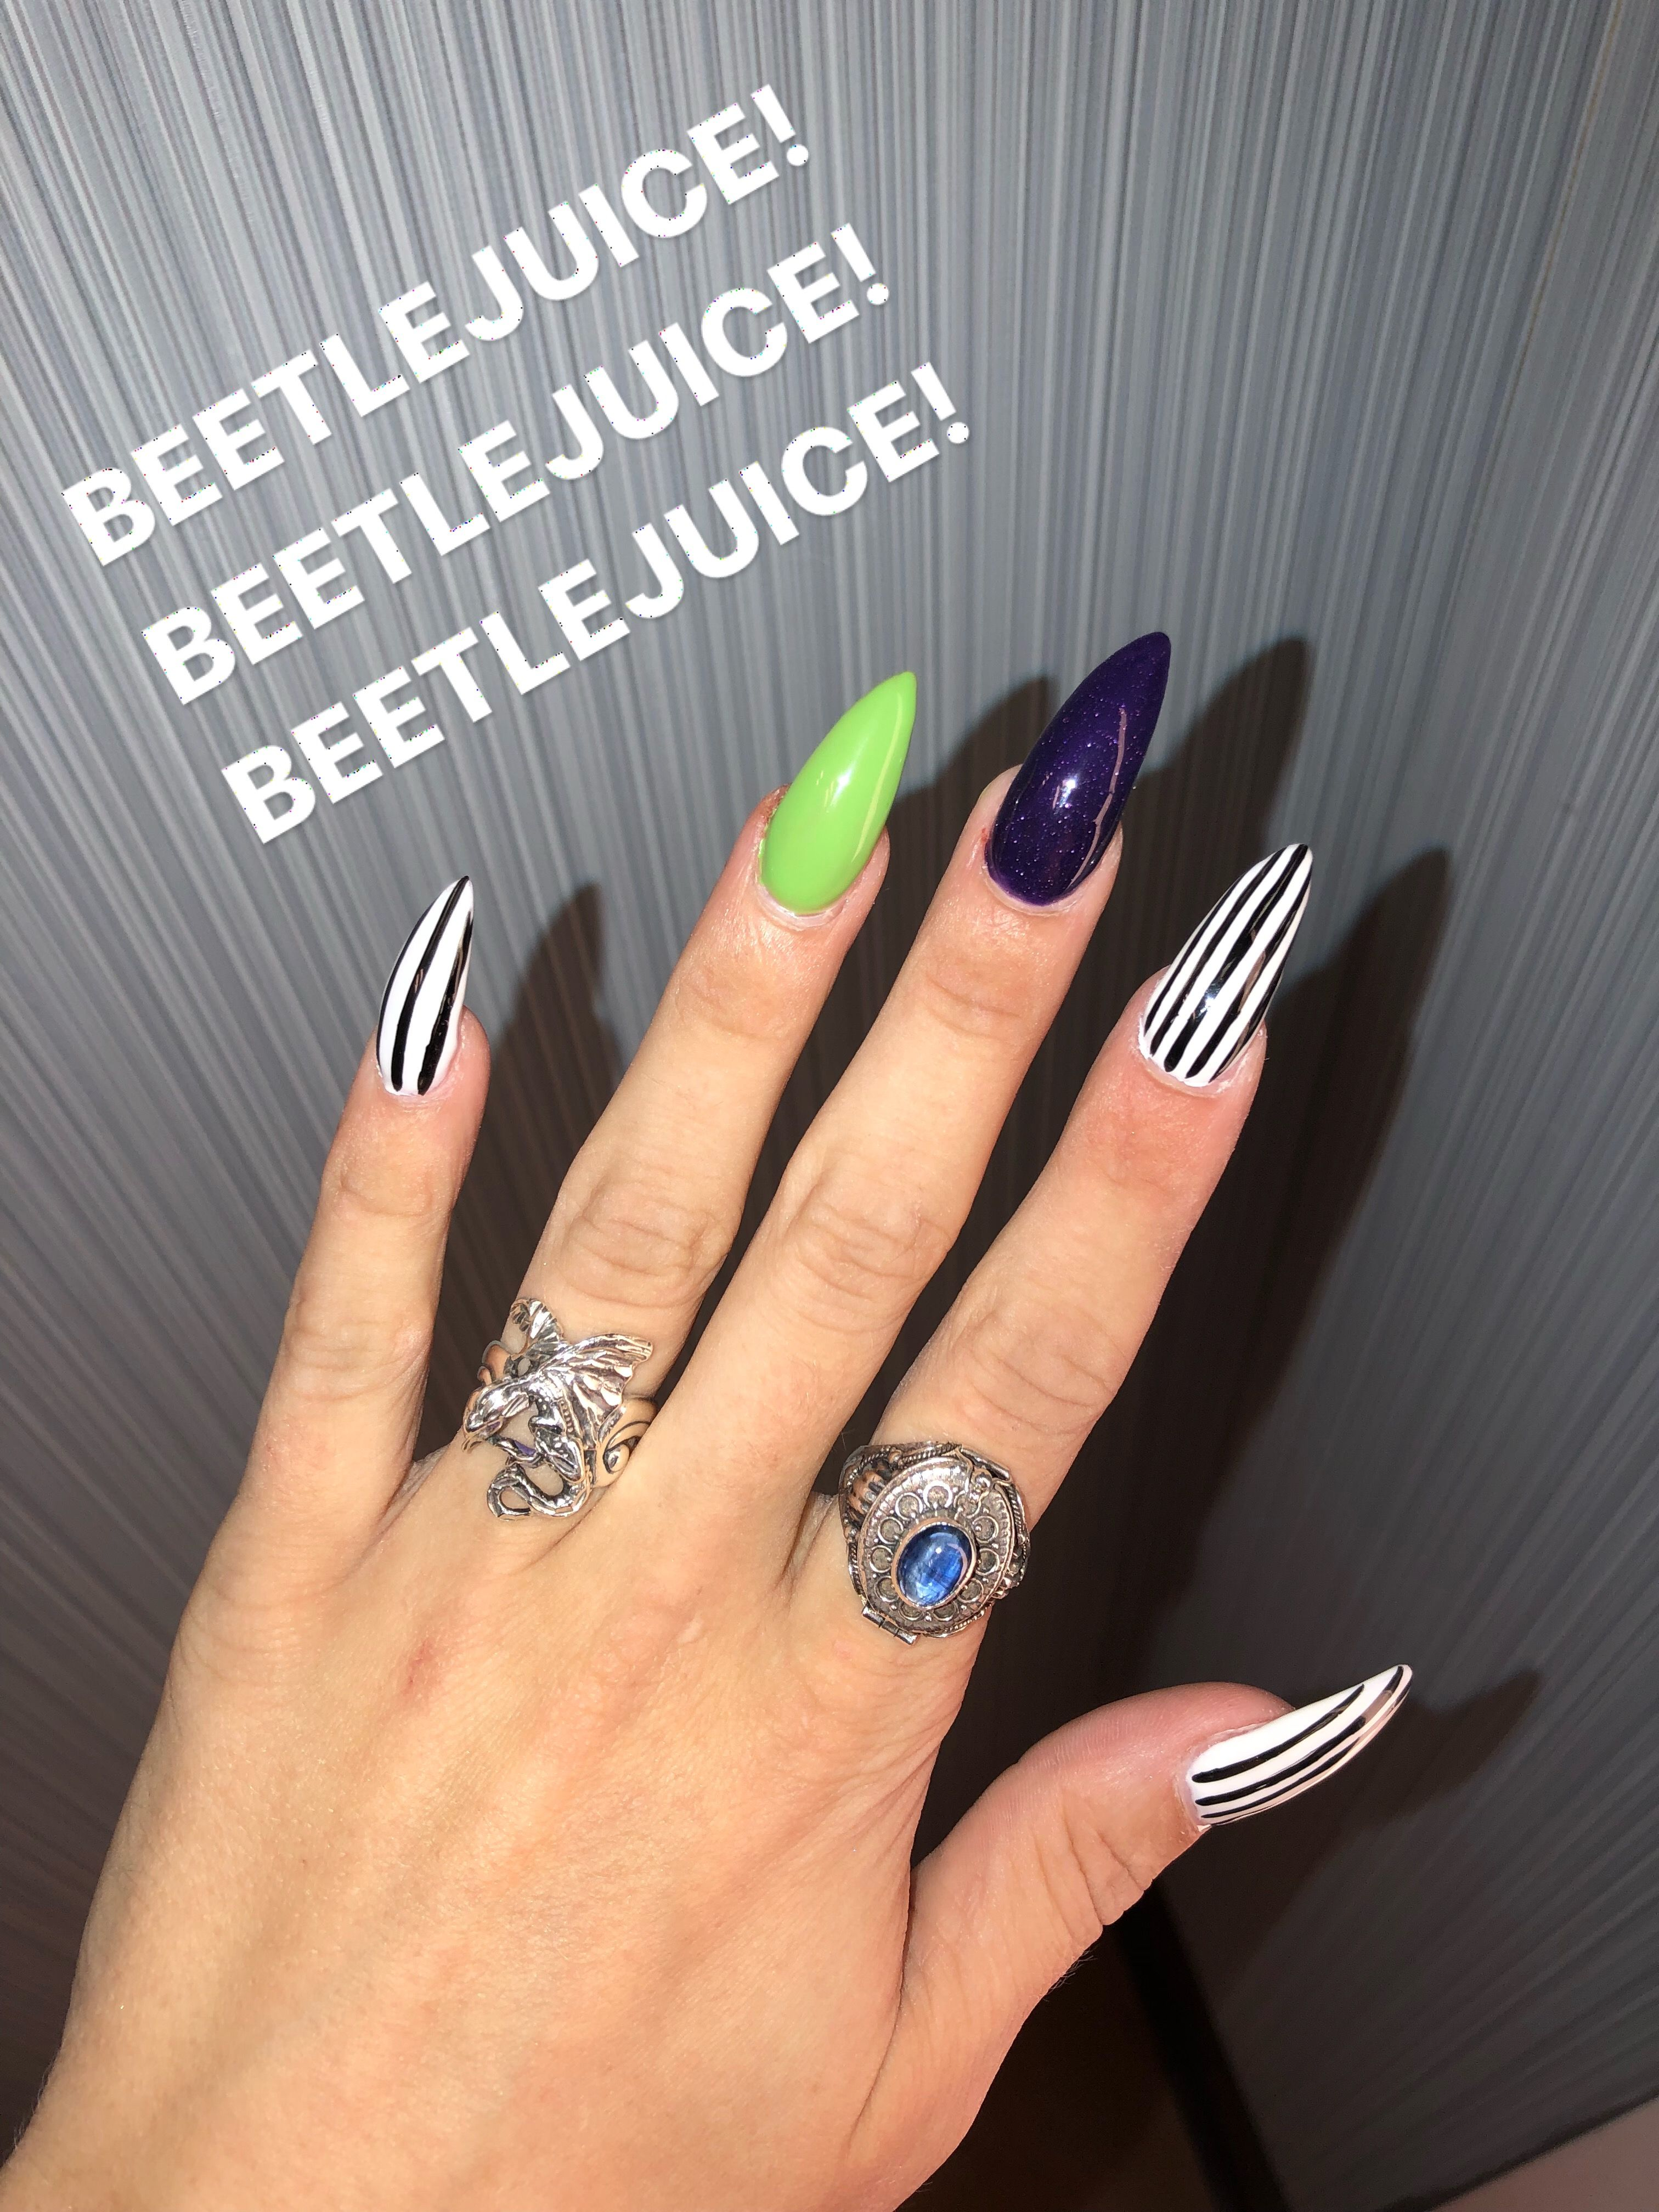 BEETLEJUICE! BEETLEJUICE! BEETLEJUICE! Beetlejuice ...